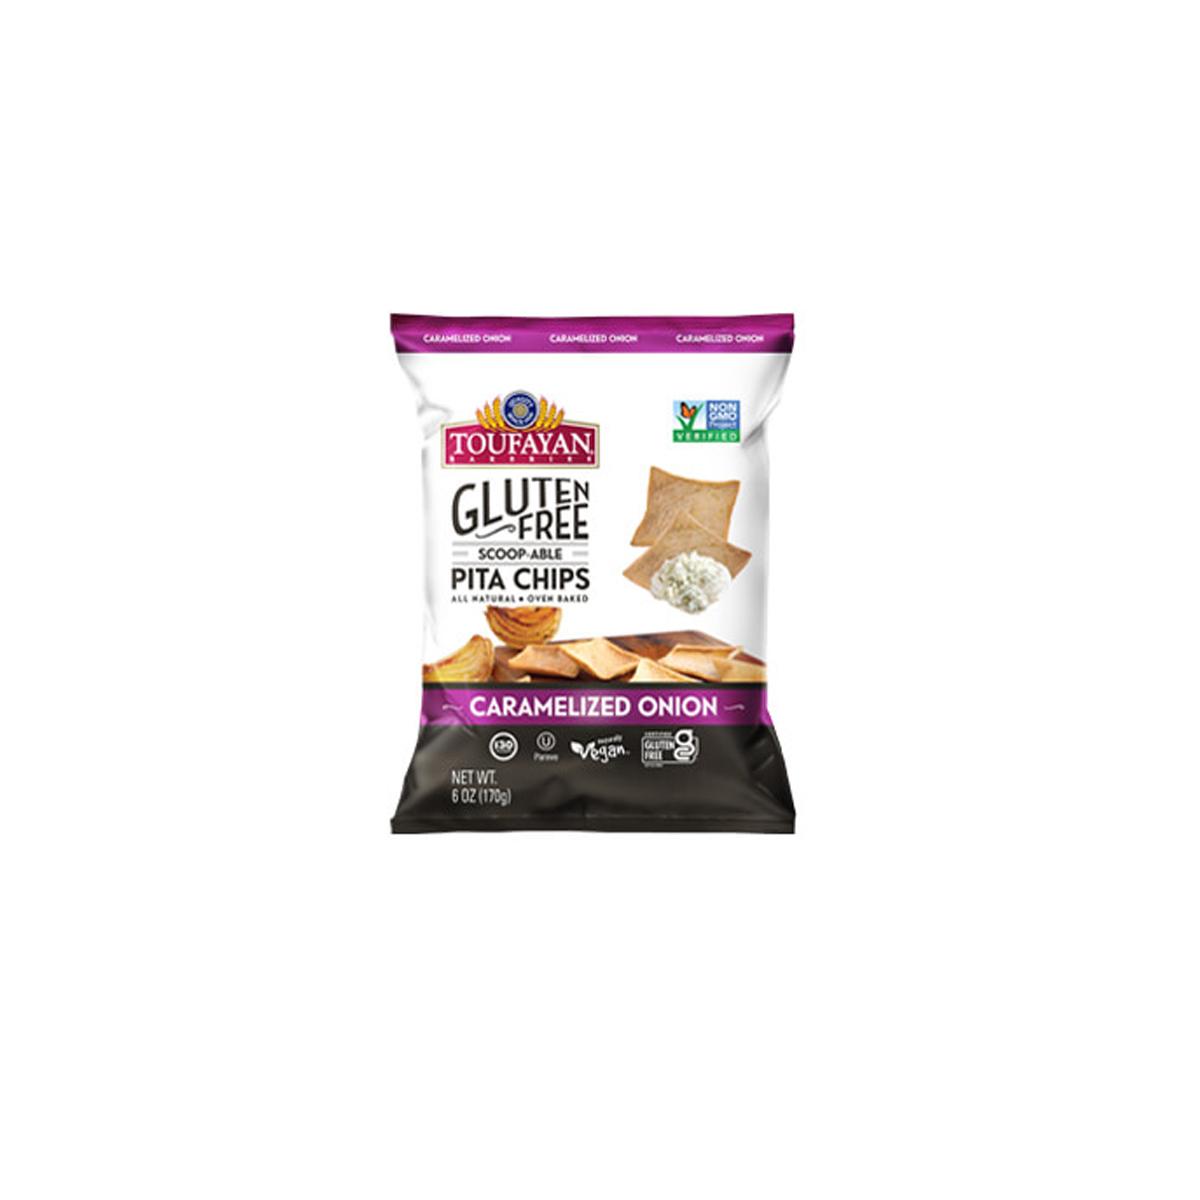 Pita Chips Caramelized Onions Gluten Free